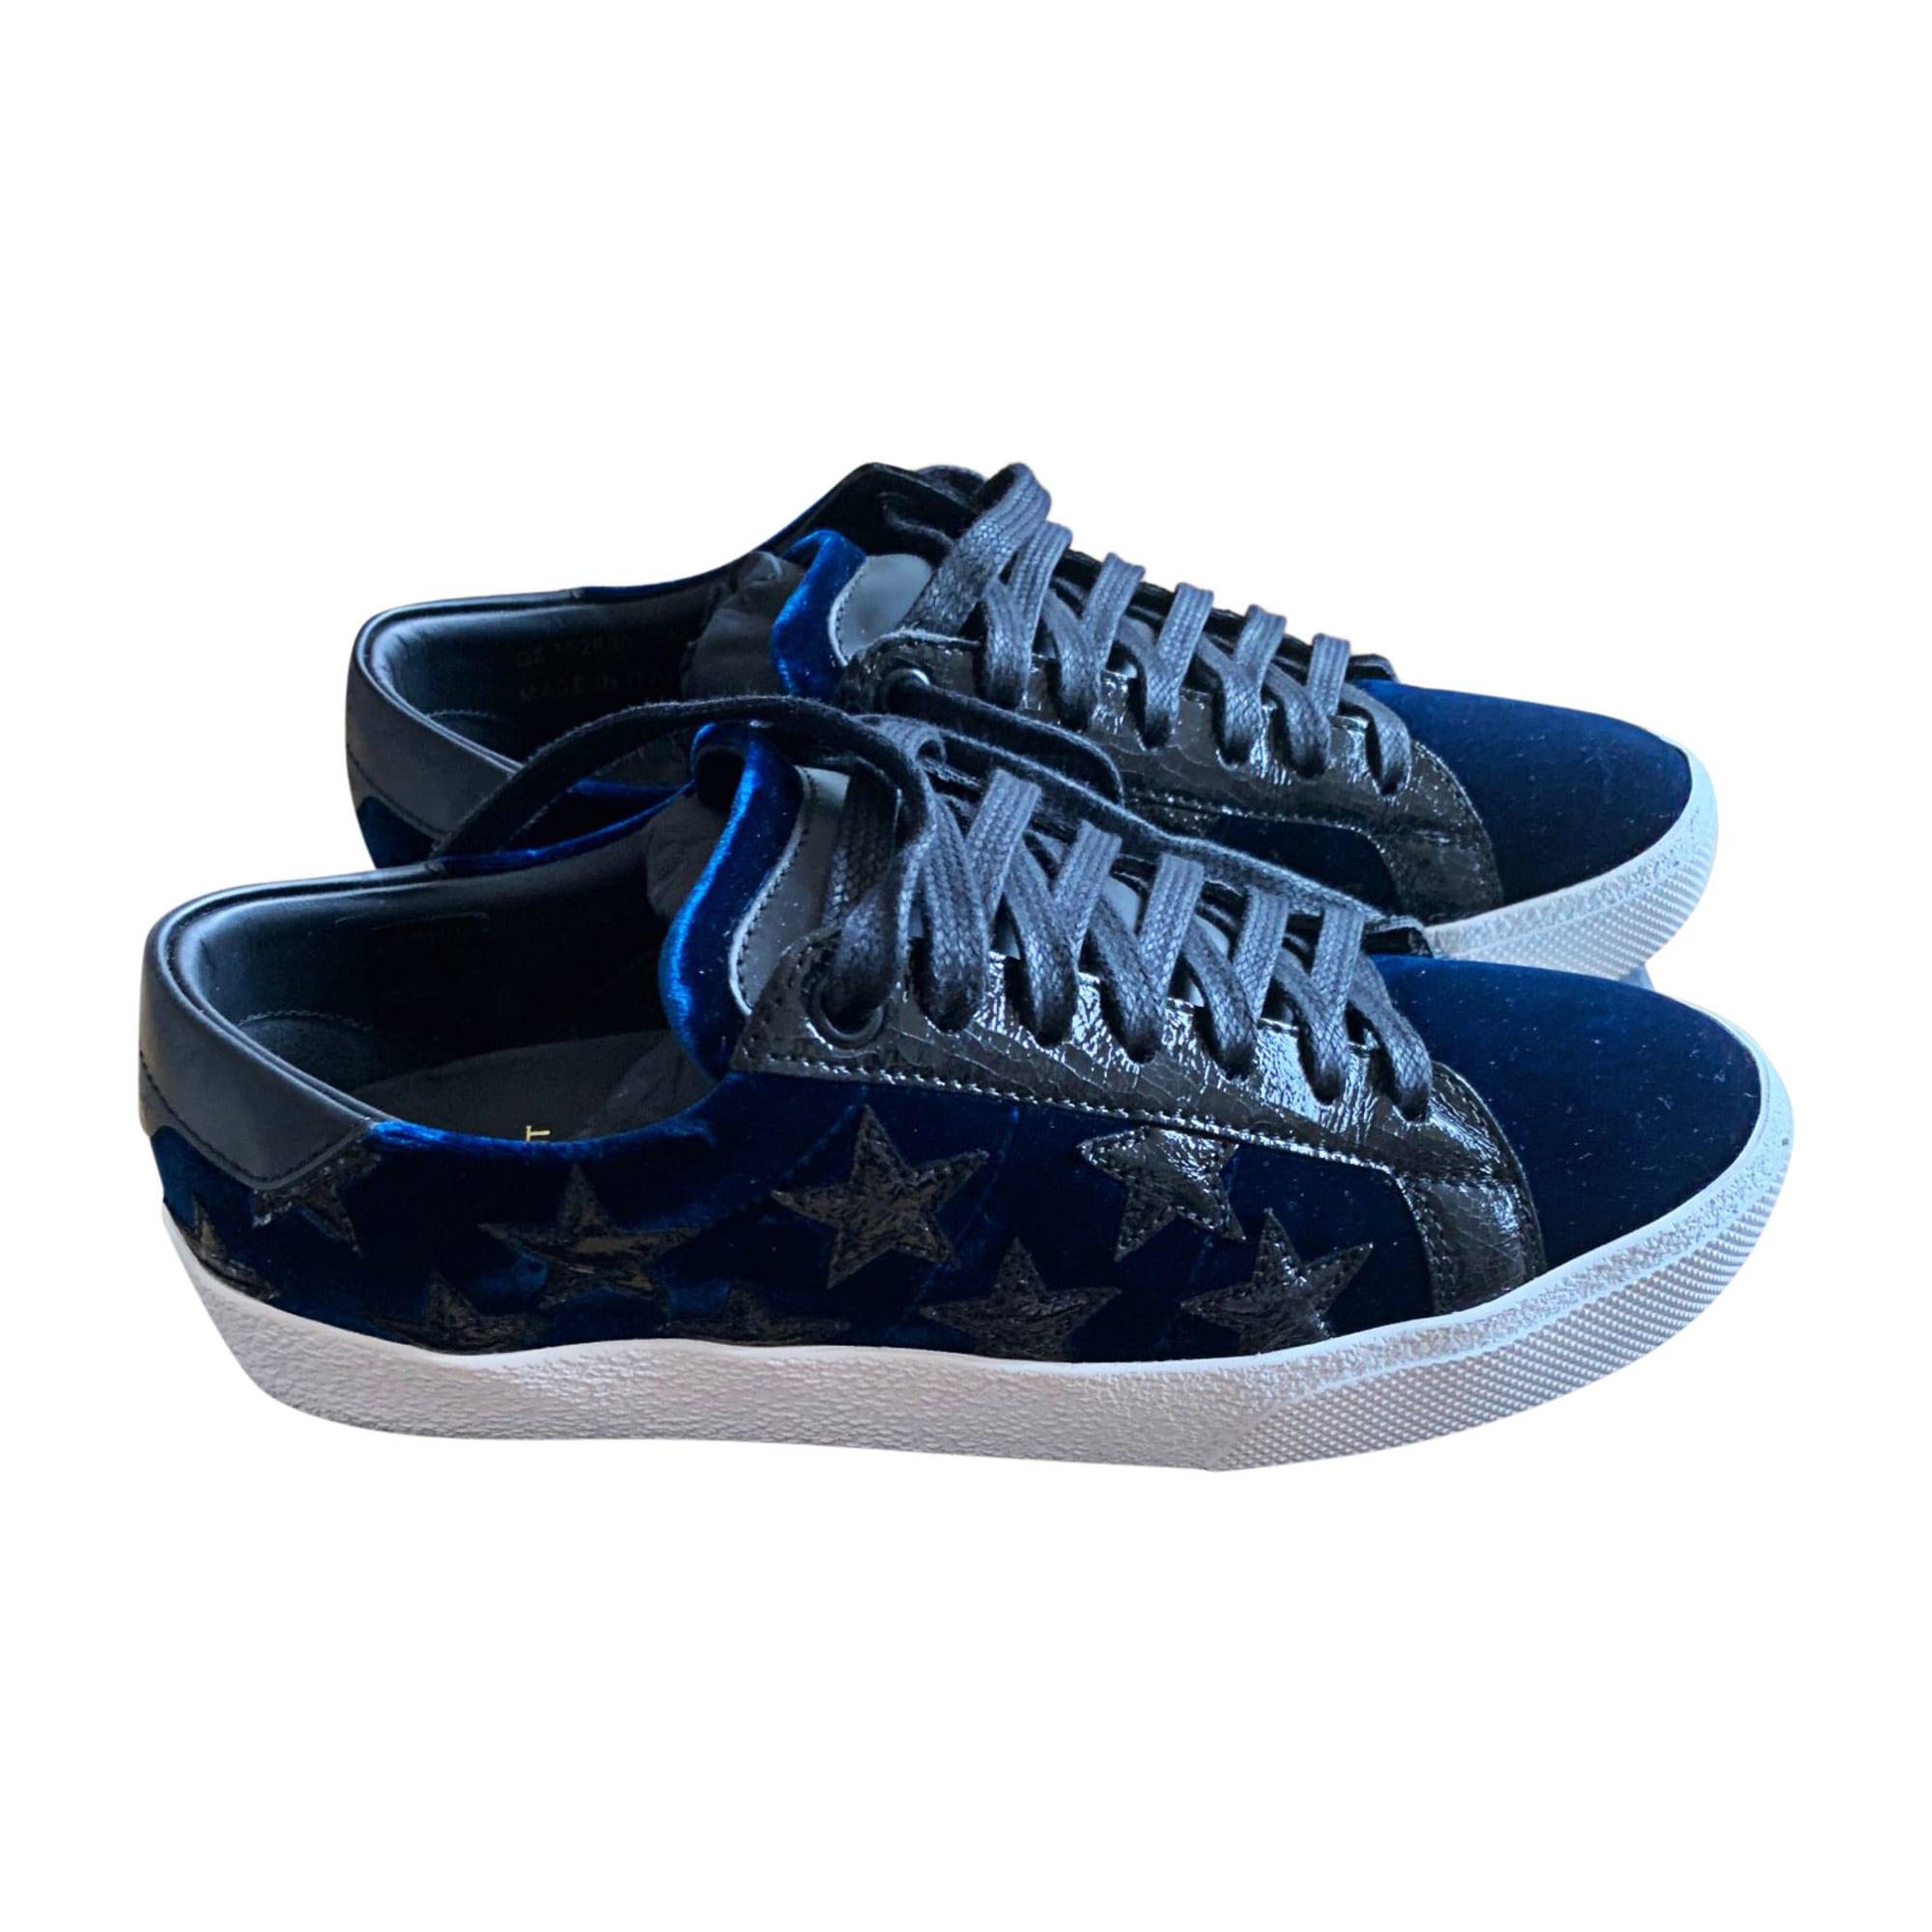 Baskets SAINT LAURENT Bleu, bleu marine, bleu turquoise